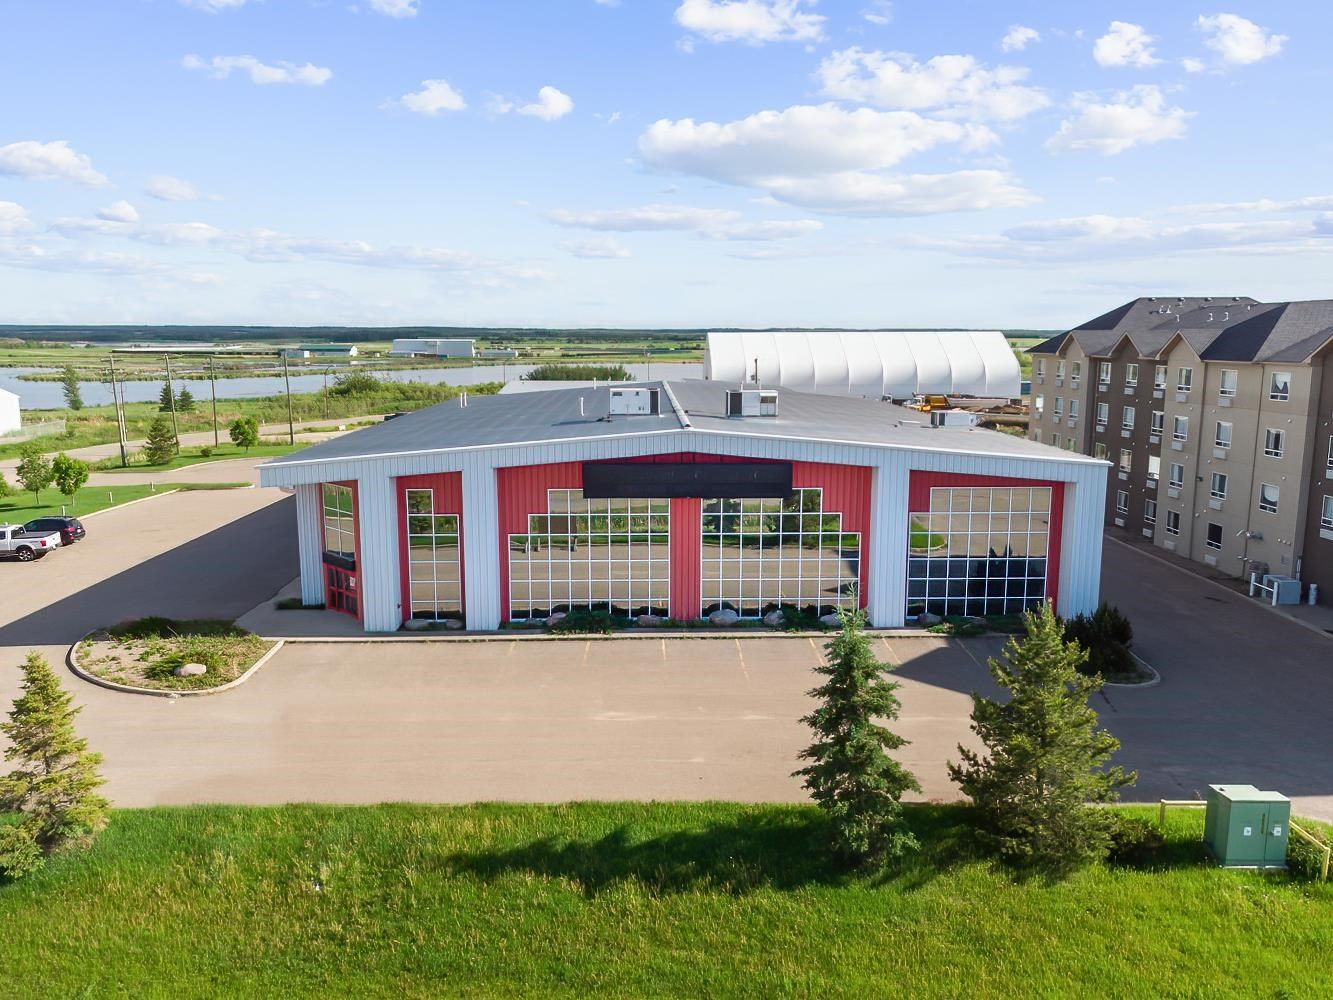 Main Photo: 5806 50th Avenue in Bonnyville Town: Bonnyville Industrial for sale : MLS®# E4248502